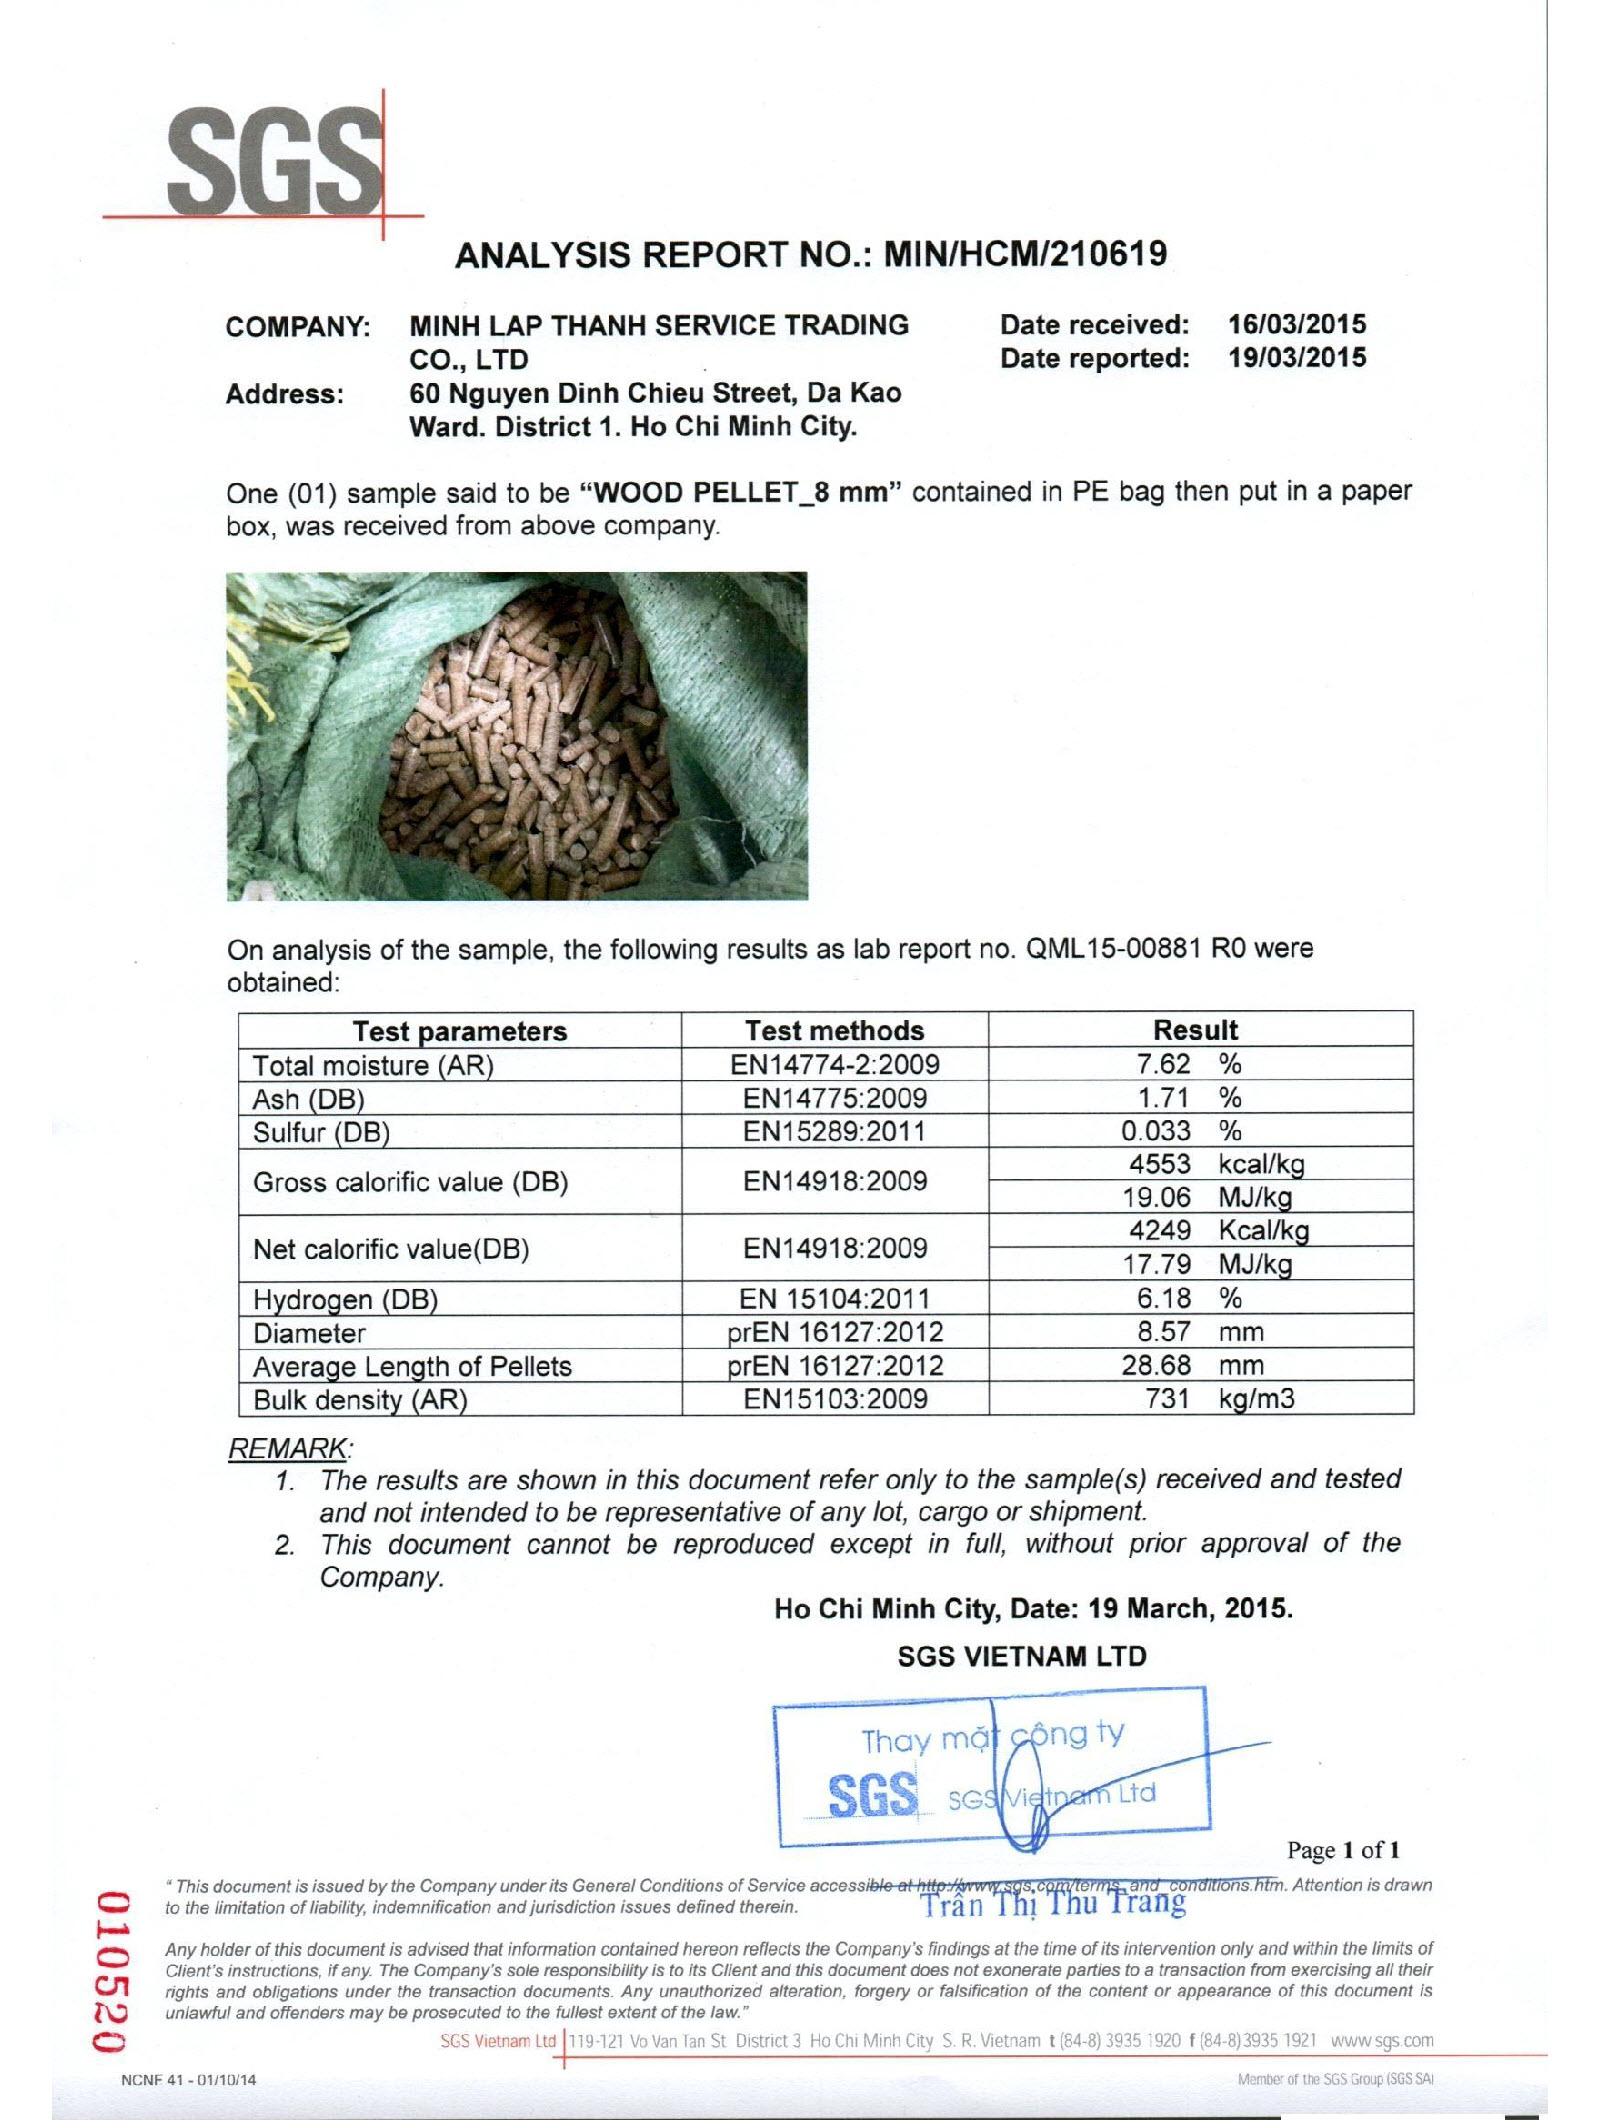 Test SGS of wood pellets